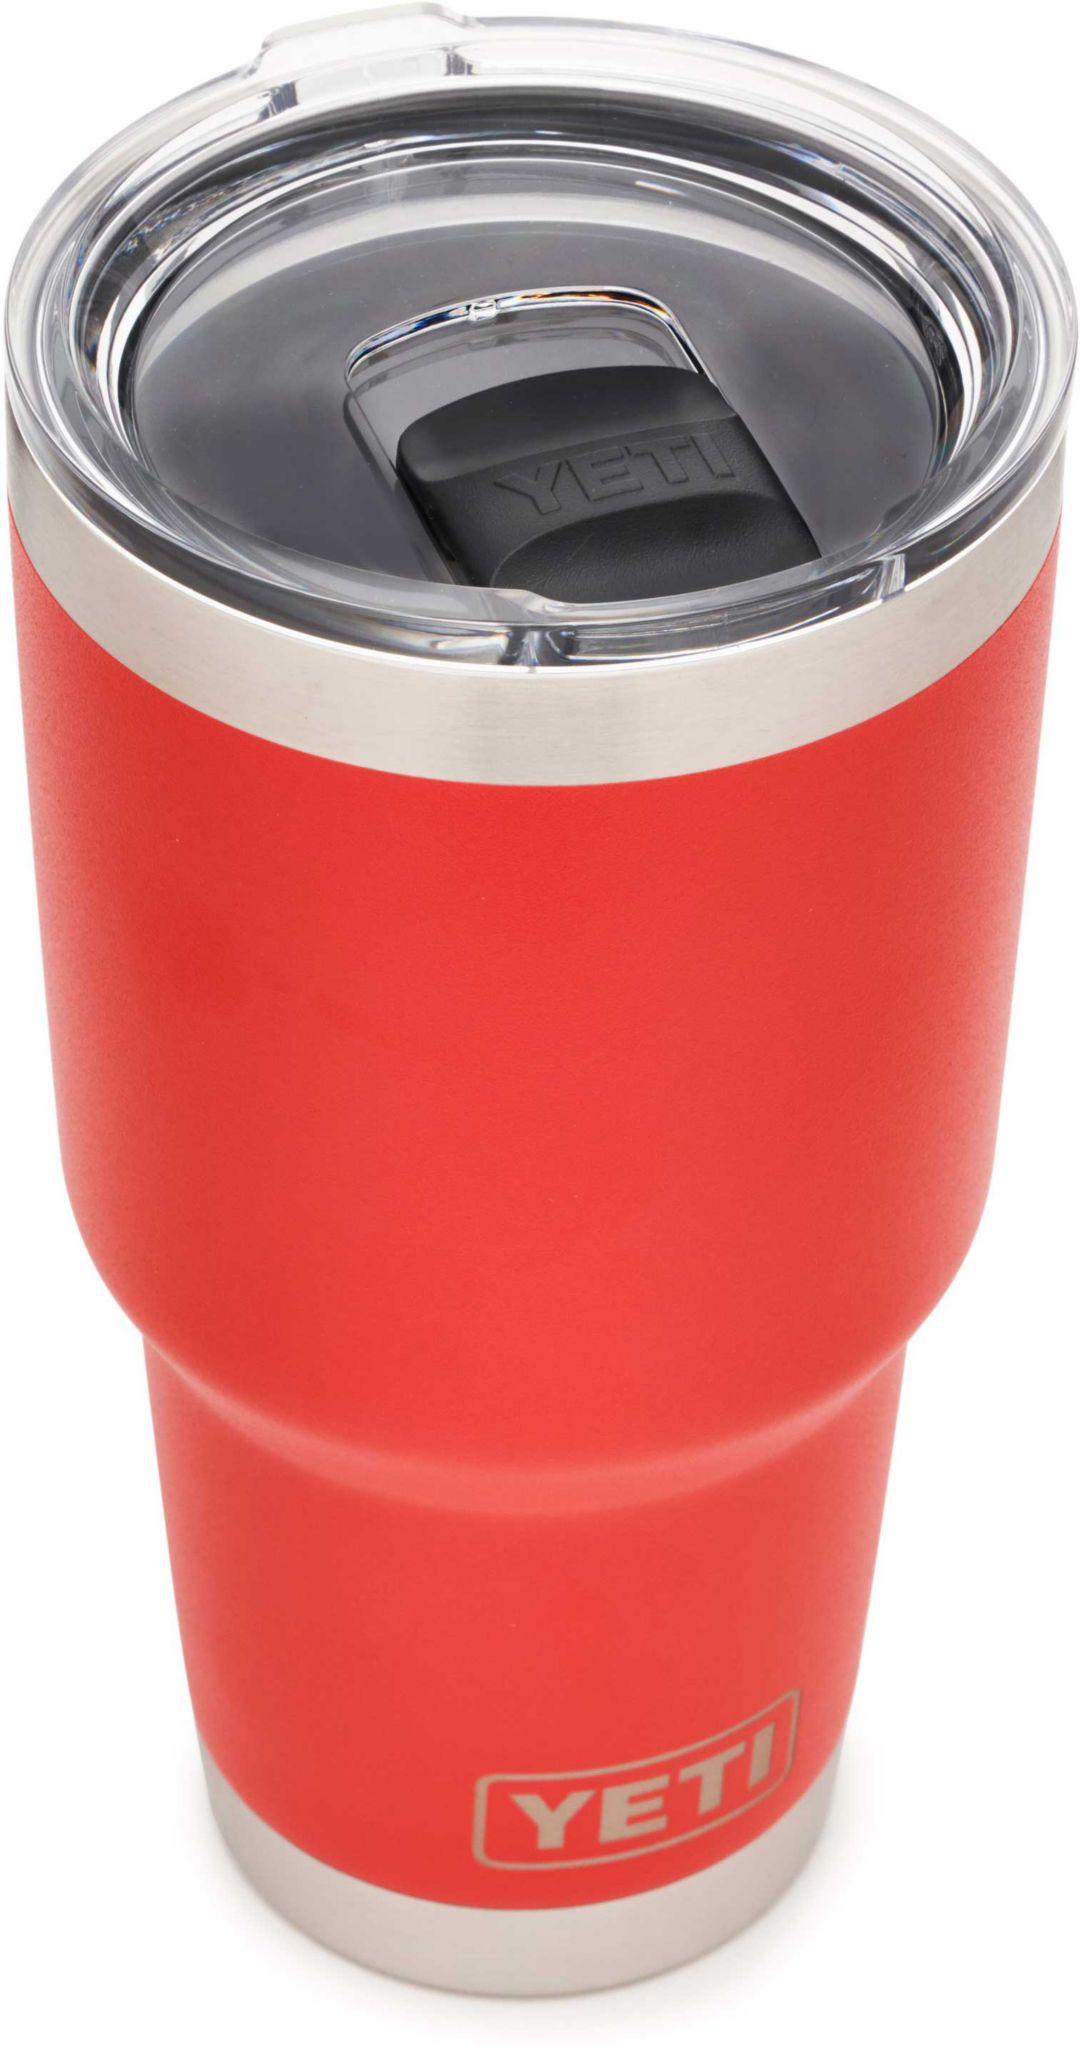 3661191ea67 YETI 30 oz Tumbler | Buy Online, Pick Up in Store at DICK'S